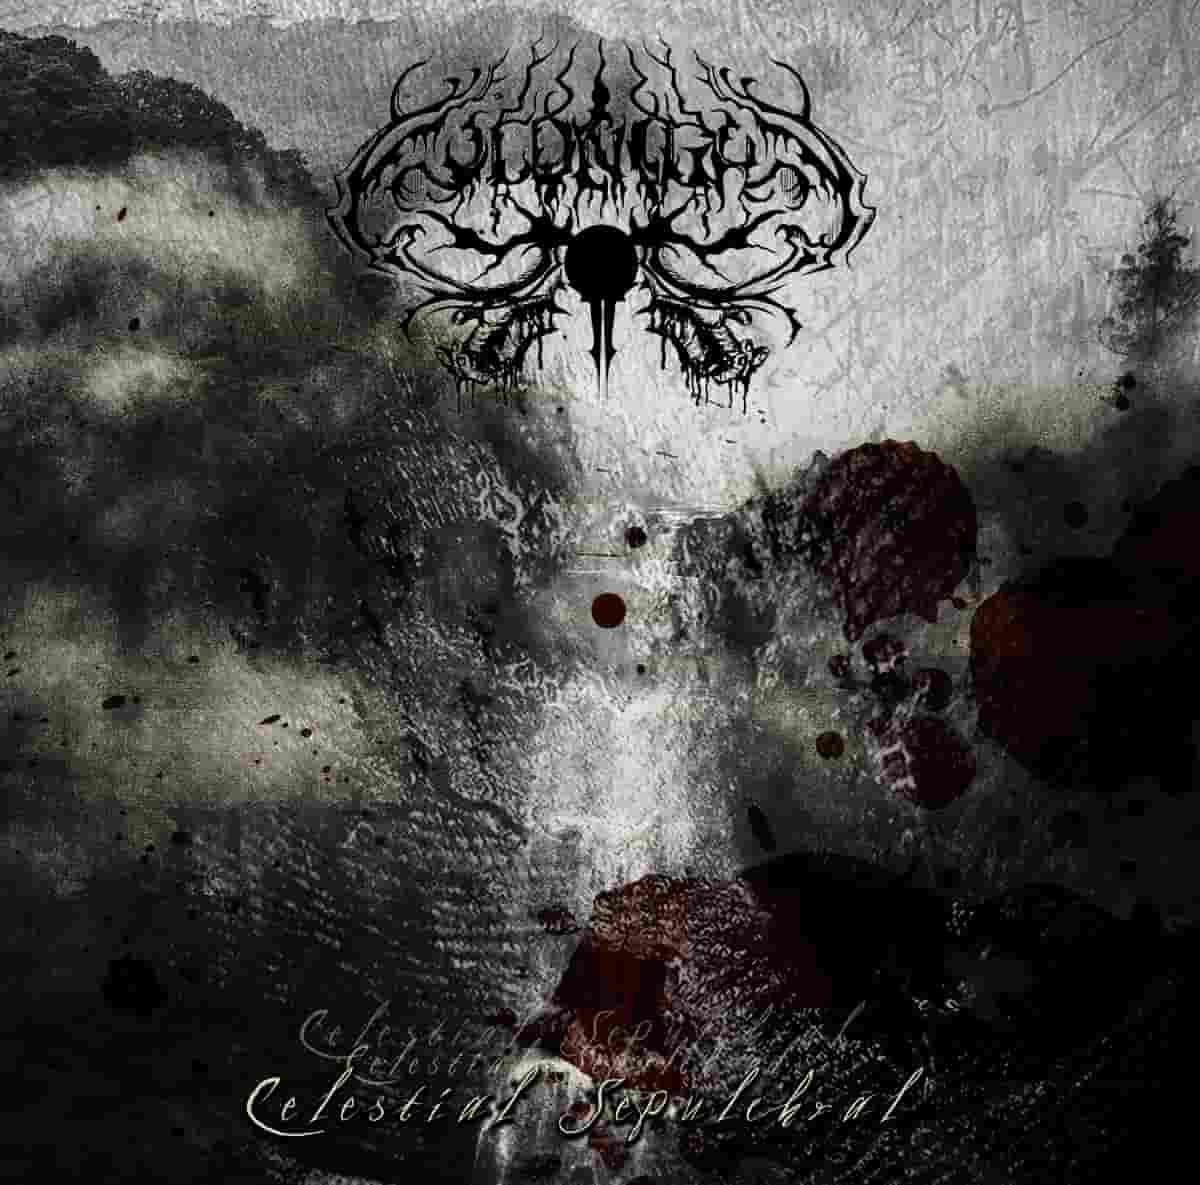 Coldnight - Celestial Sepulchral